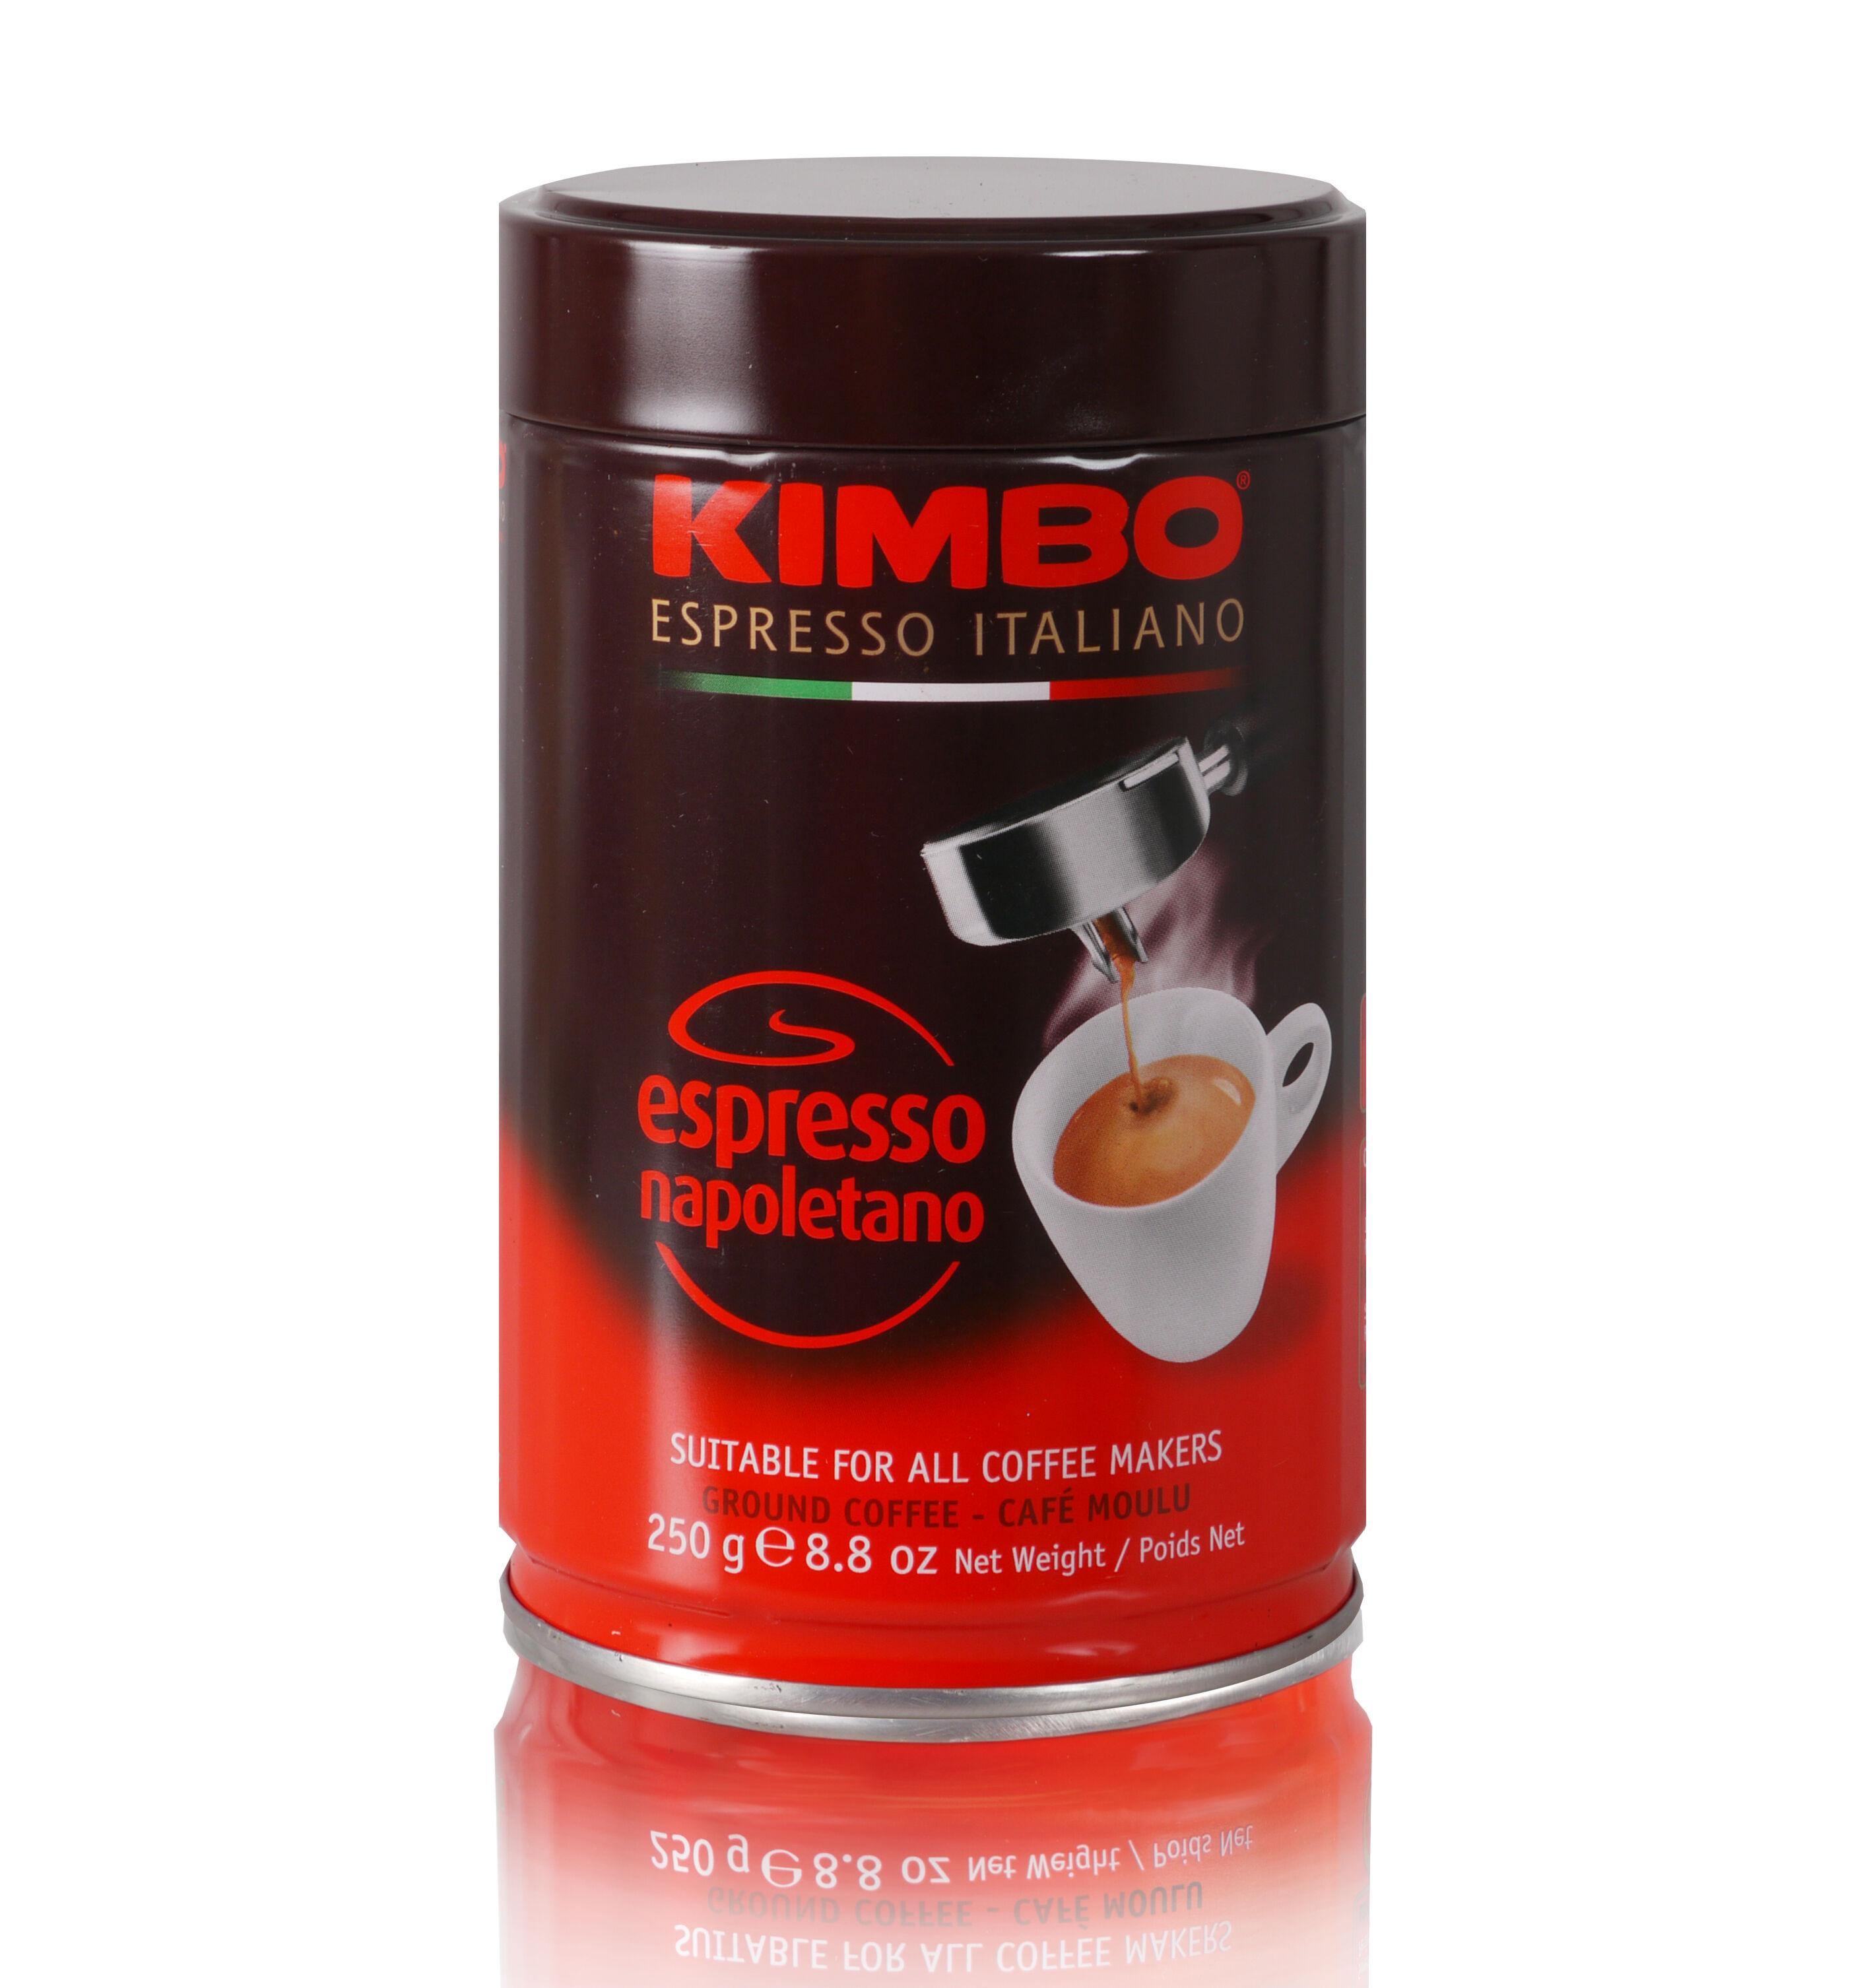 KIMBO Espresso Napoletano 12x 250 g gemahlen in Dosen